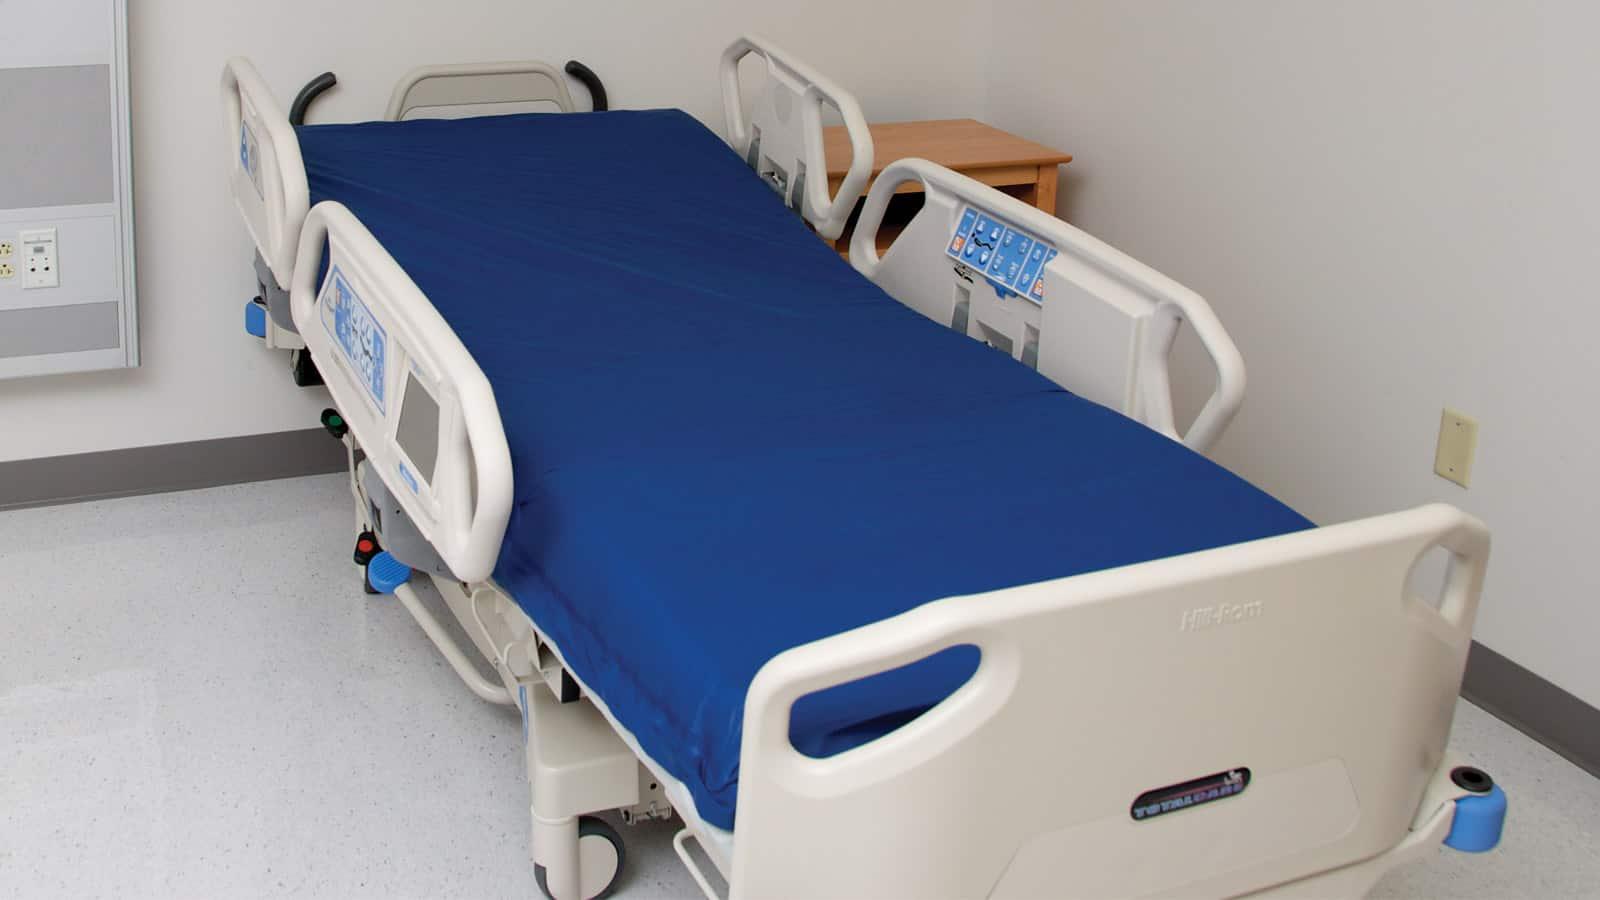 Plastic Mattress Cover For Hospital Bed Best Plastic 2018